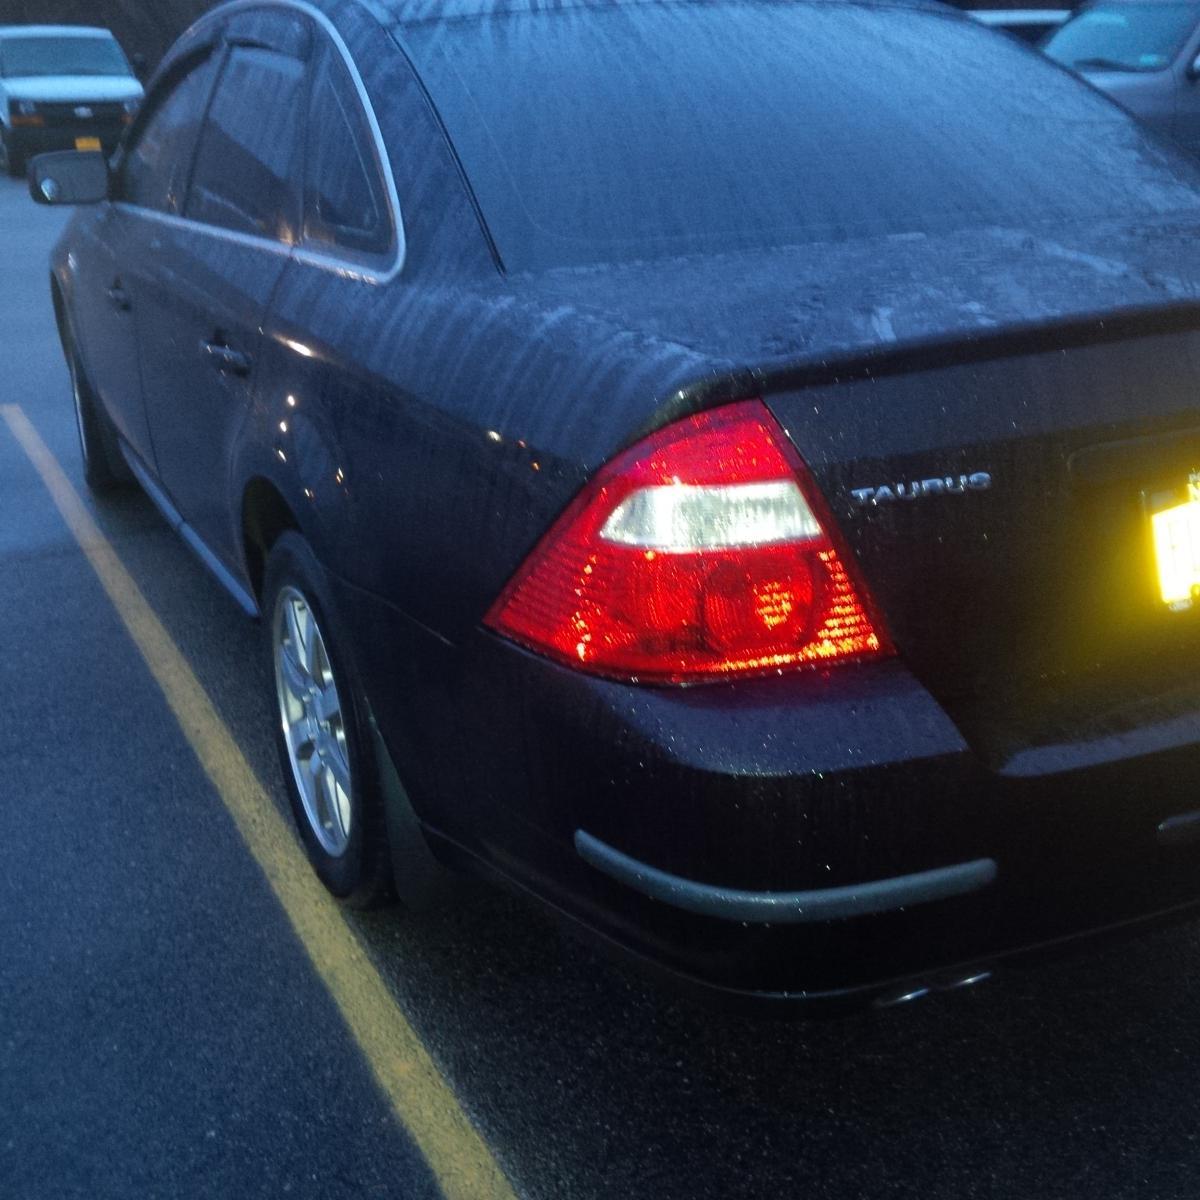 http://www.taurusclub.com/forum/attachments/5th-6th-gen-aesthetics-interior-wheels-tires/130682d1419423503-five-hundred-tail-lights-my-09-img_20141224_071424.jpg